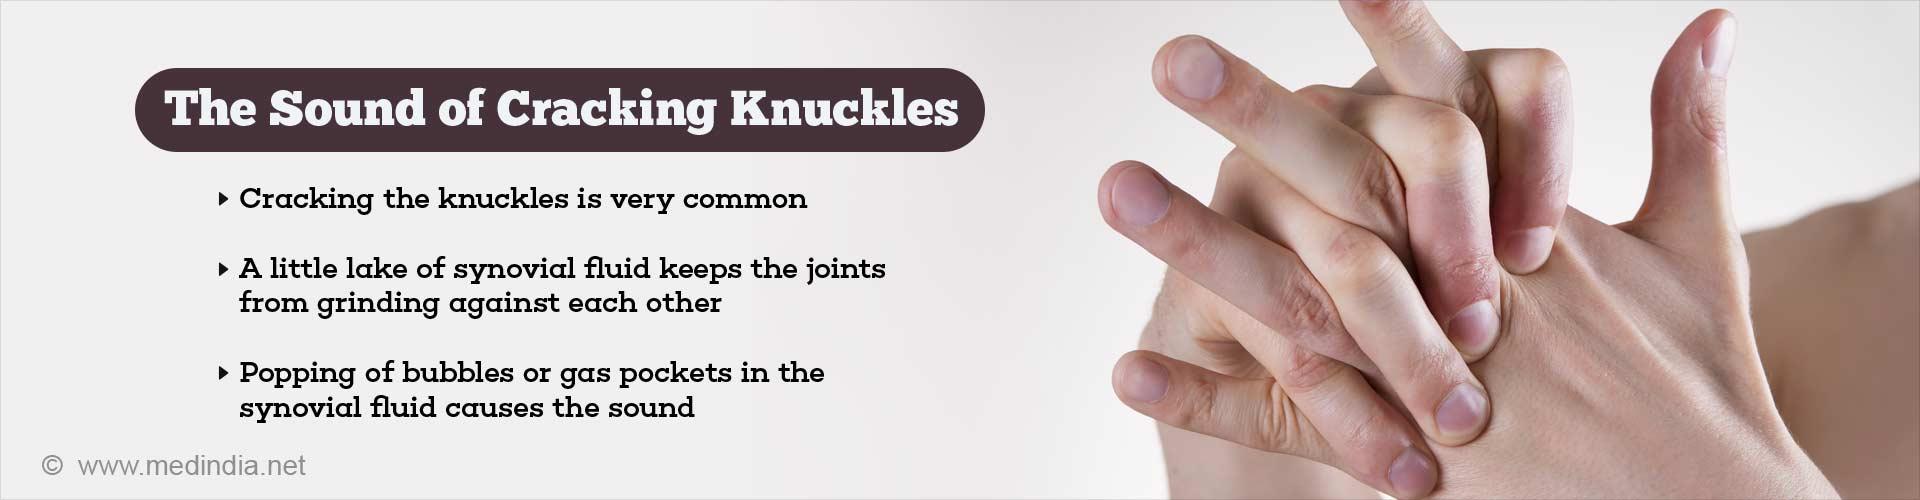 Knuckle-cracking Sound Explained